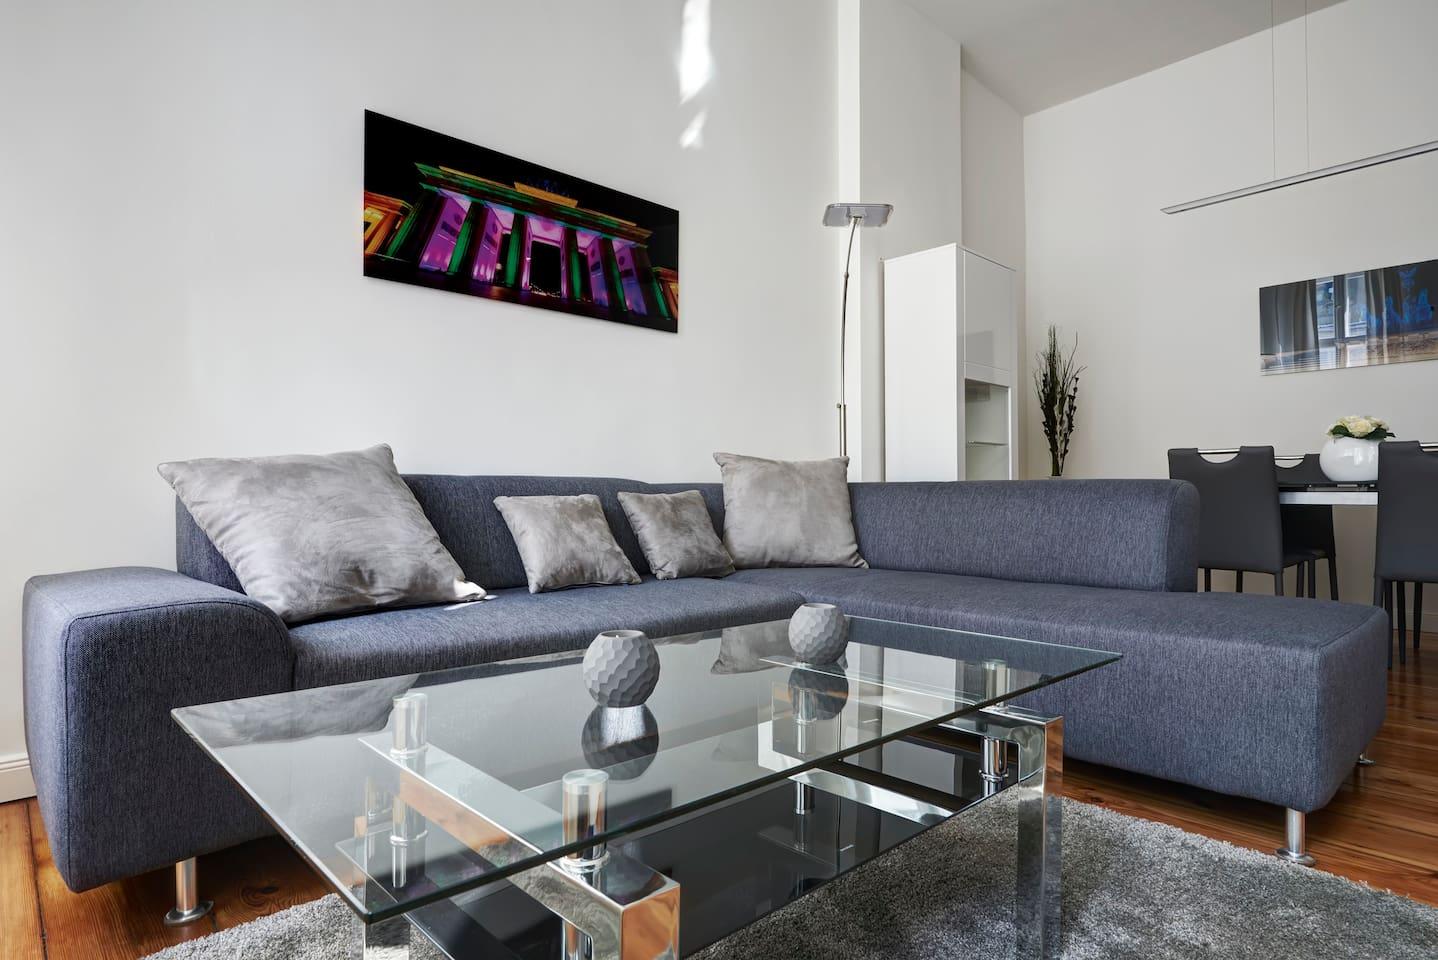 Designer Apartment - Katerinka Facility Management GmbH